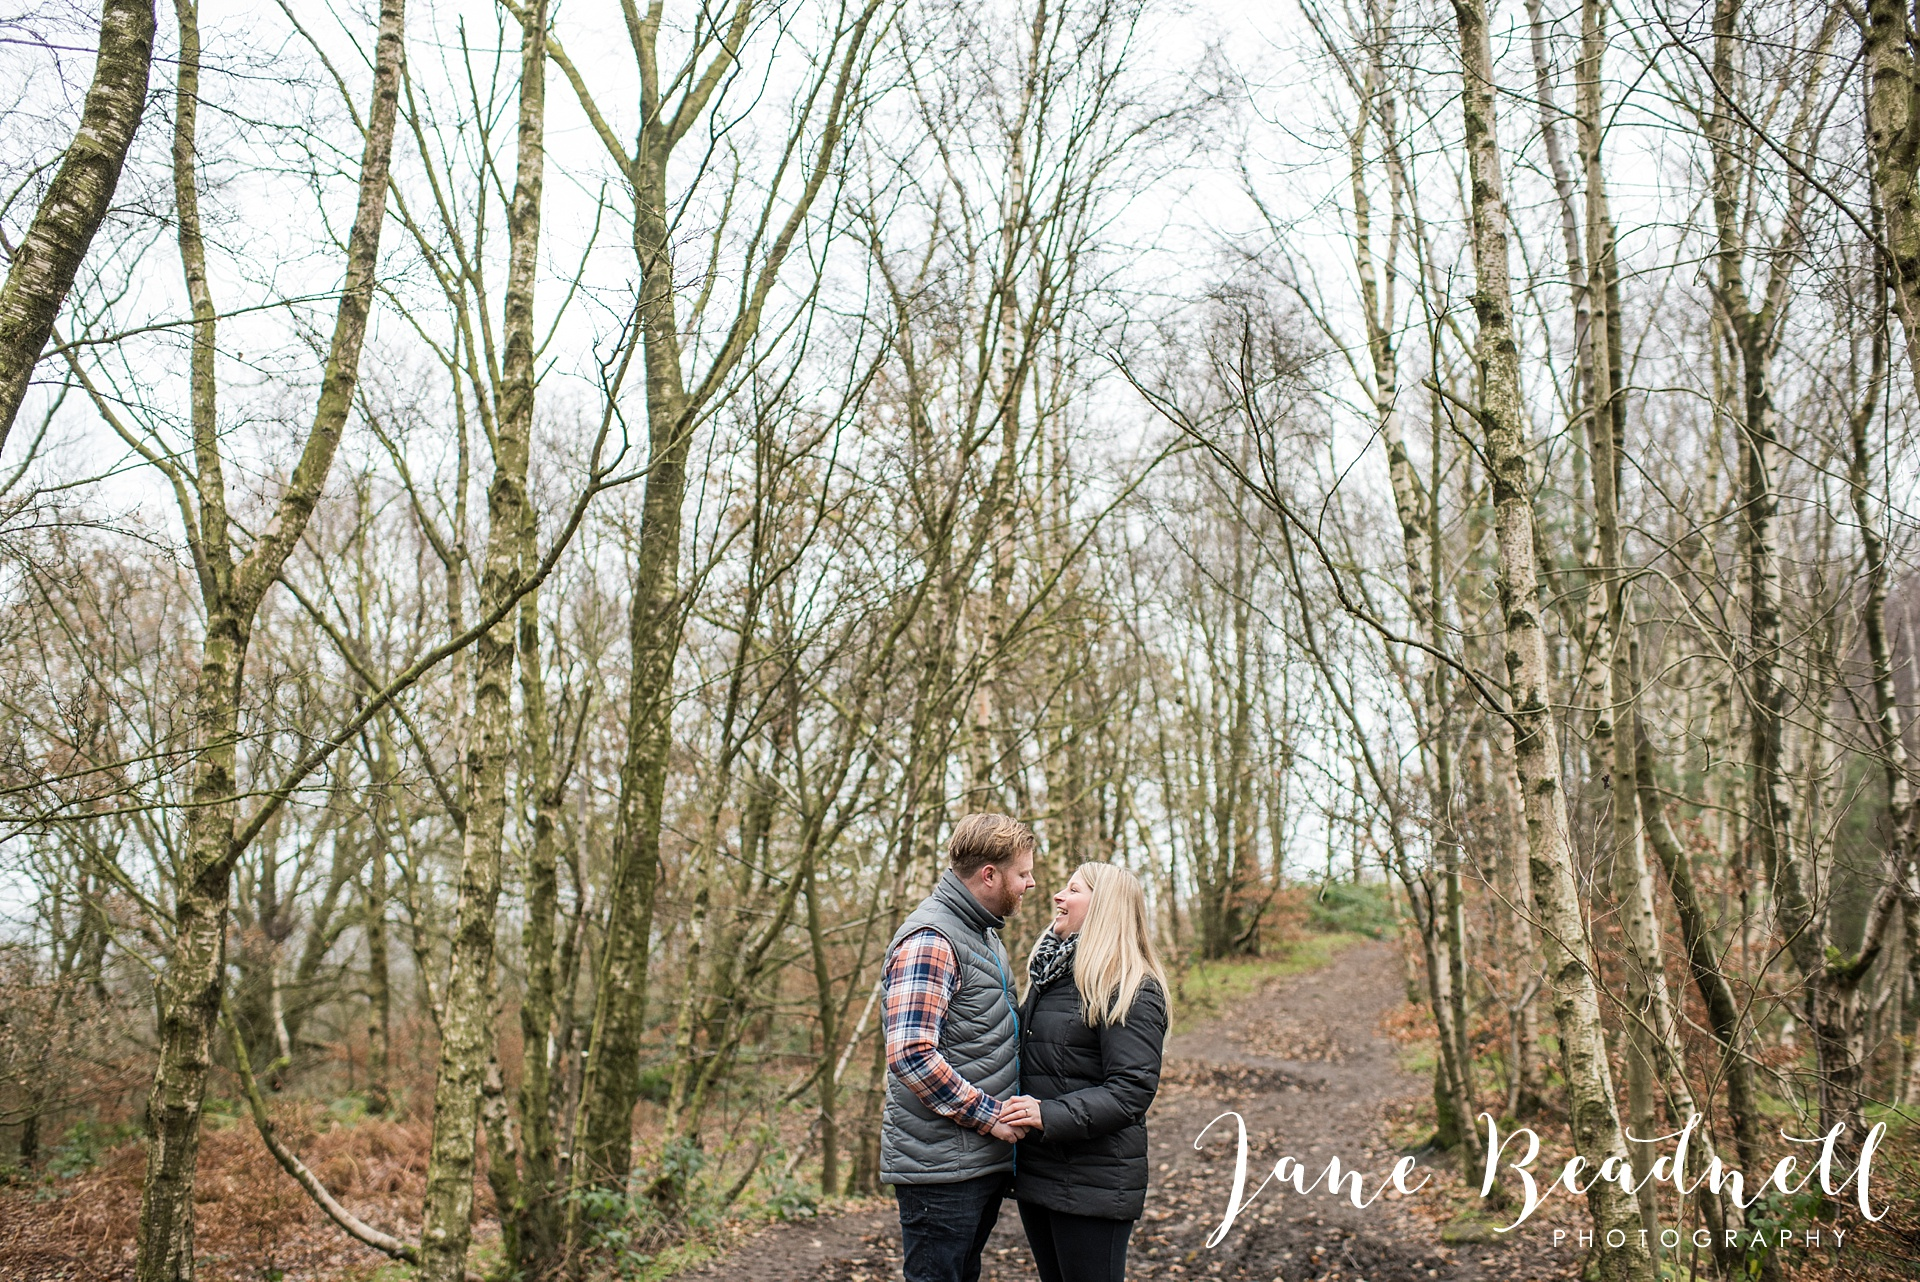 yorkshire-wedding-photographer-jane-beadnell-photography-uk-and-destination-wedding-photographer-engagement-shoot_0011